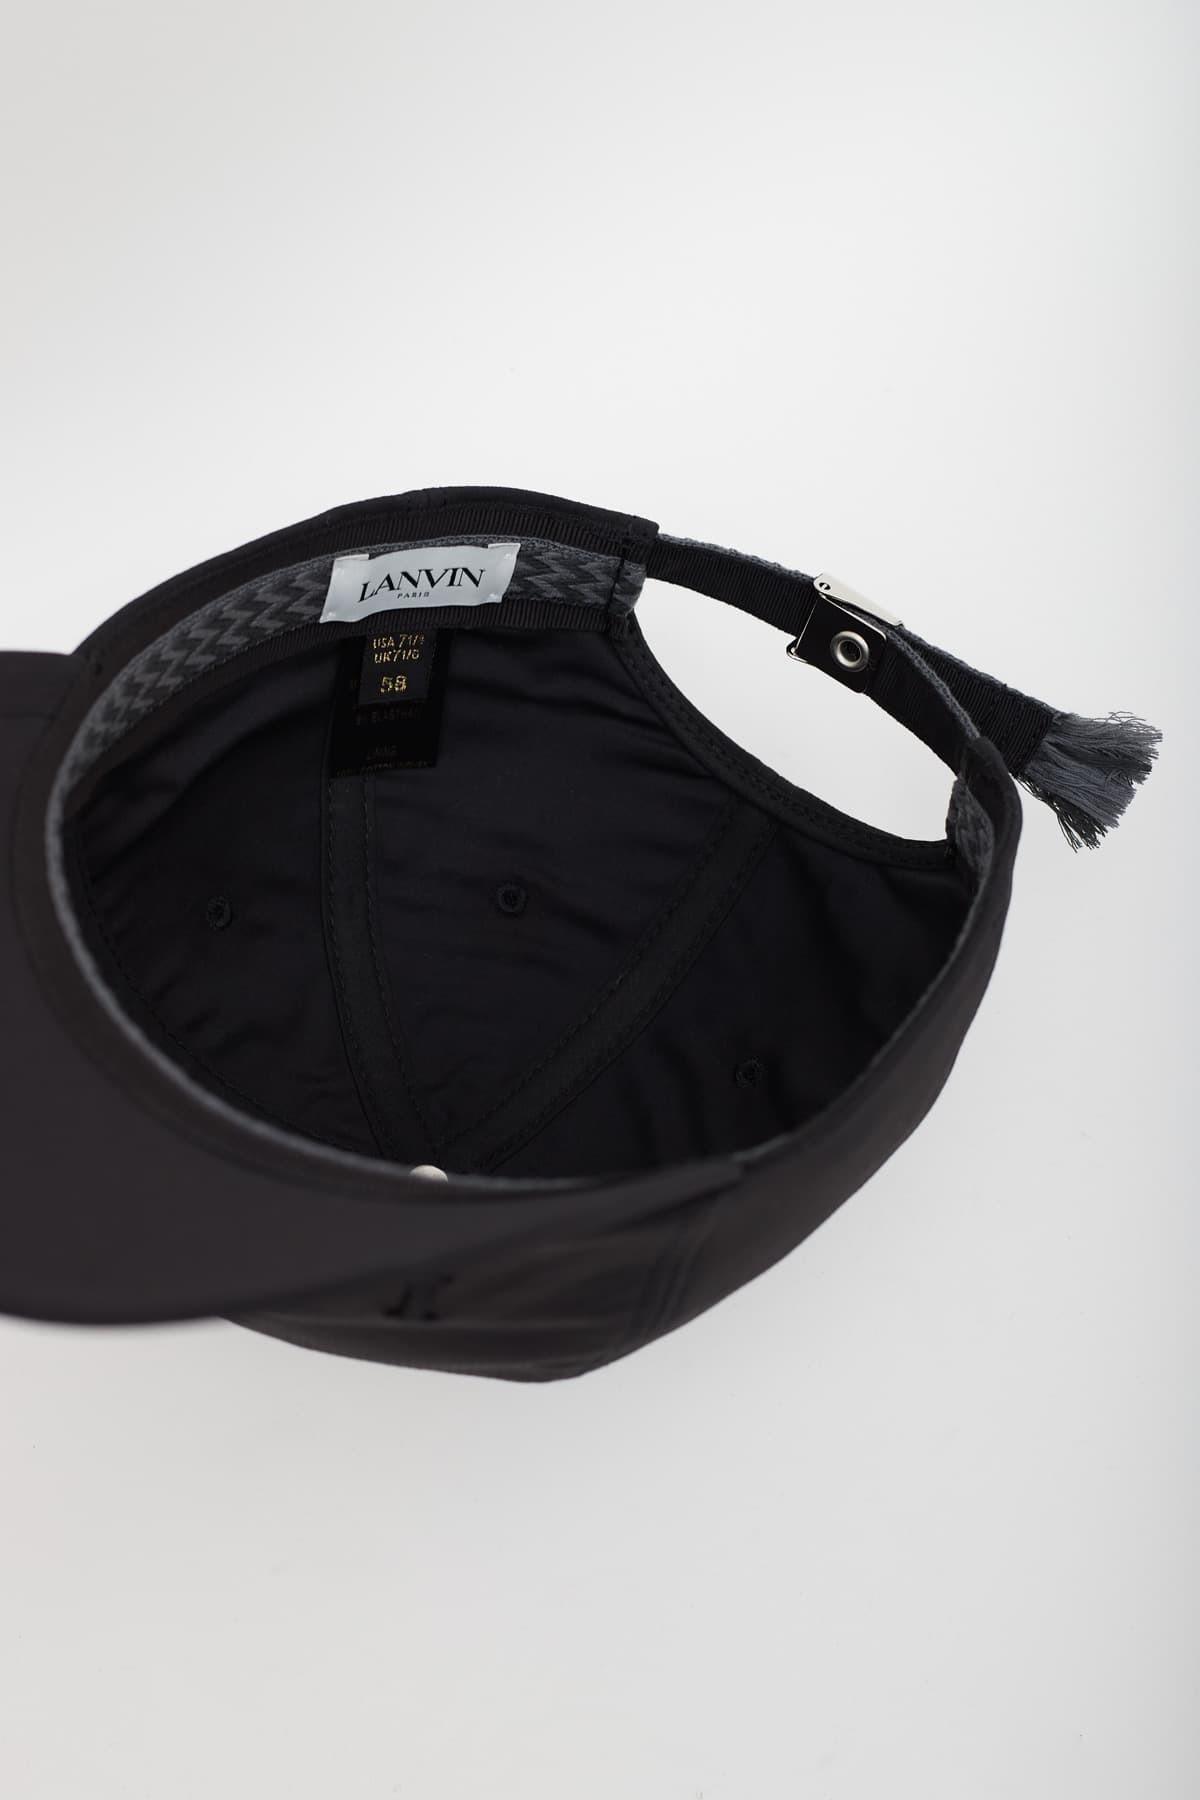 Comprar Carhartt Wip Space Master LS Shirt